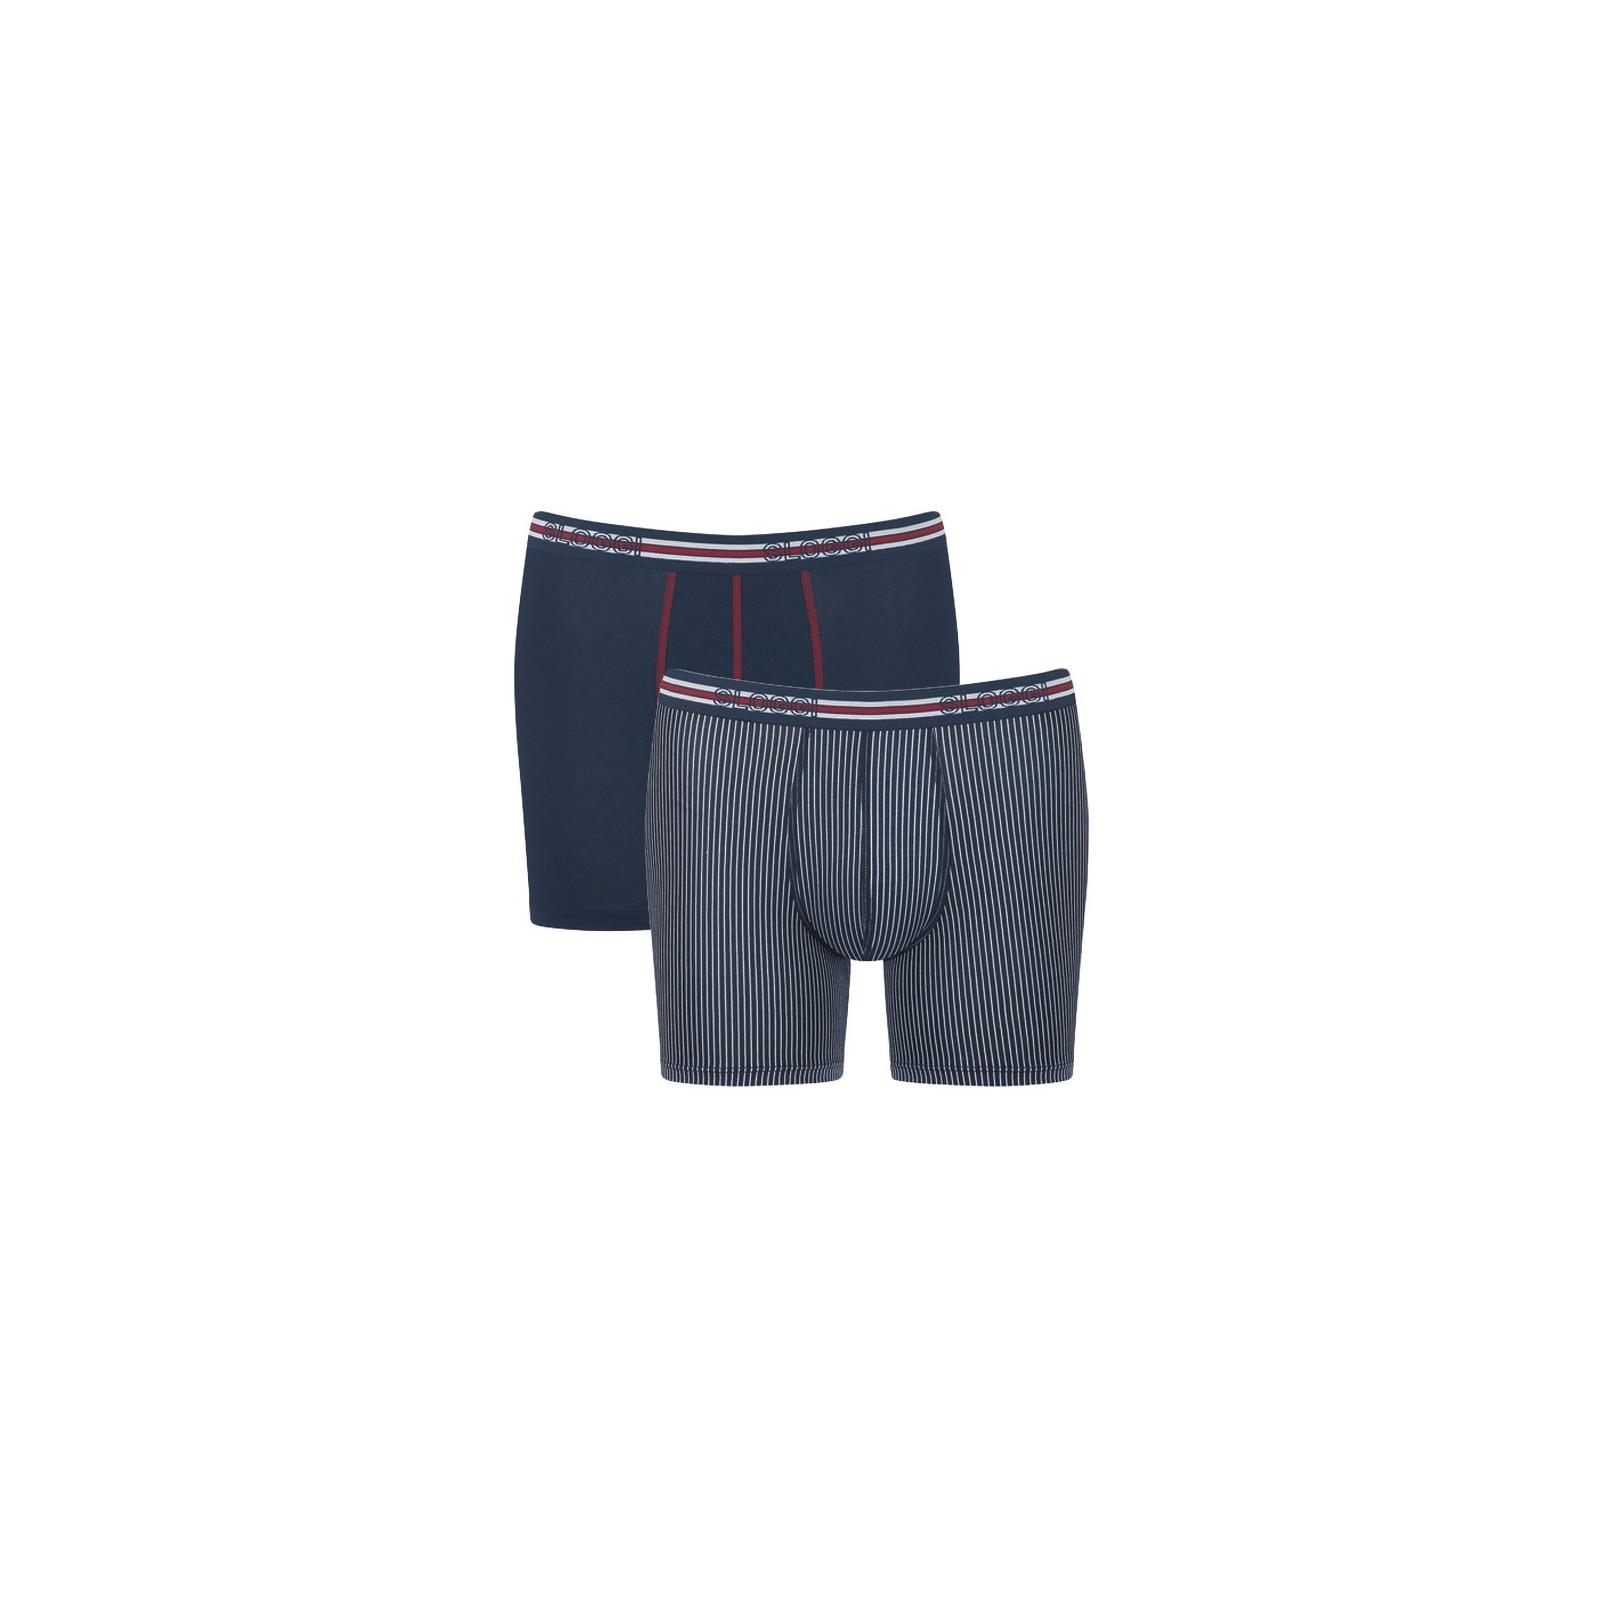 Sloggi Men Match Short C2P 2-Pack Blue-Light Combination